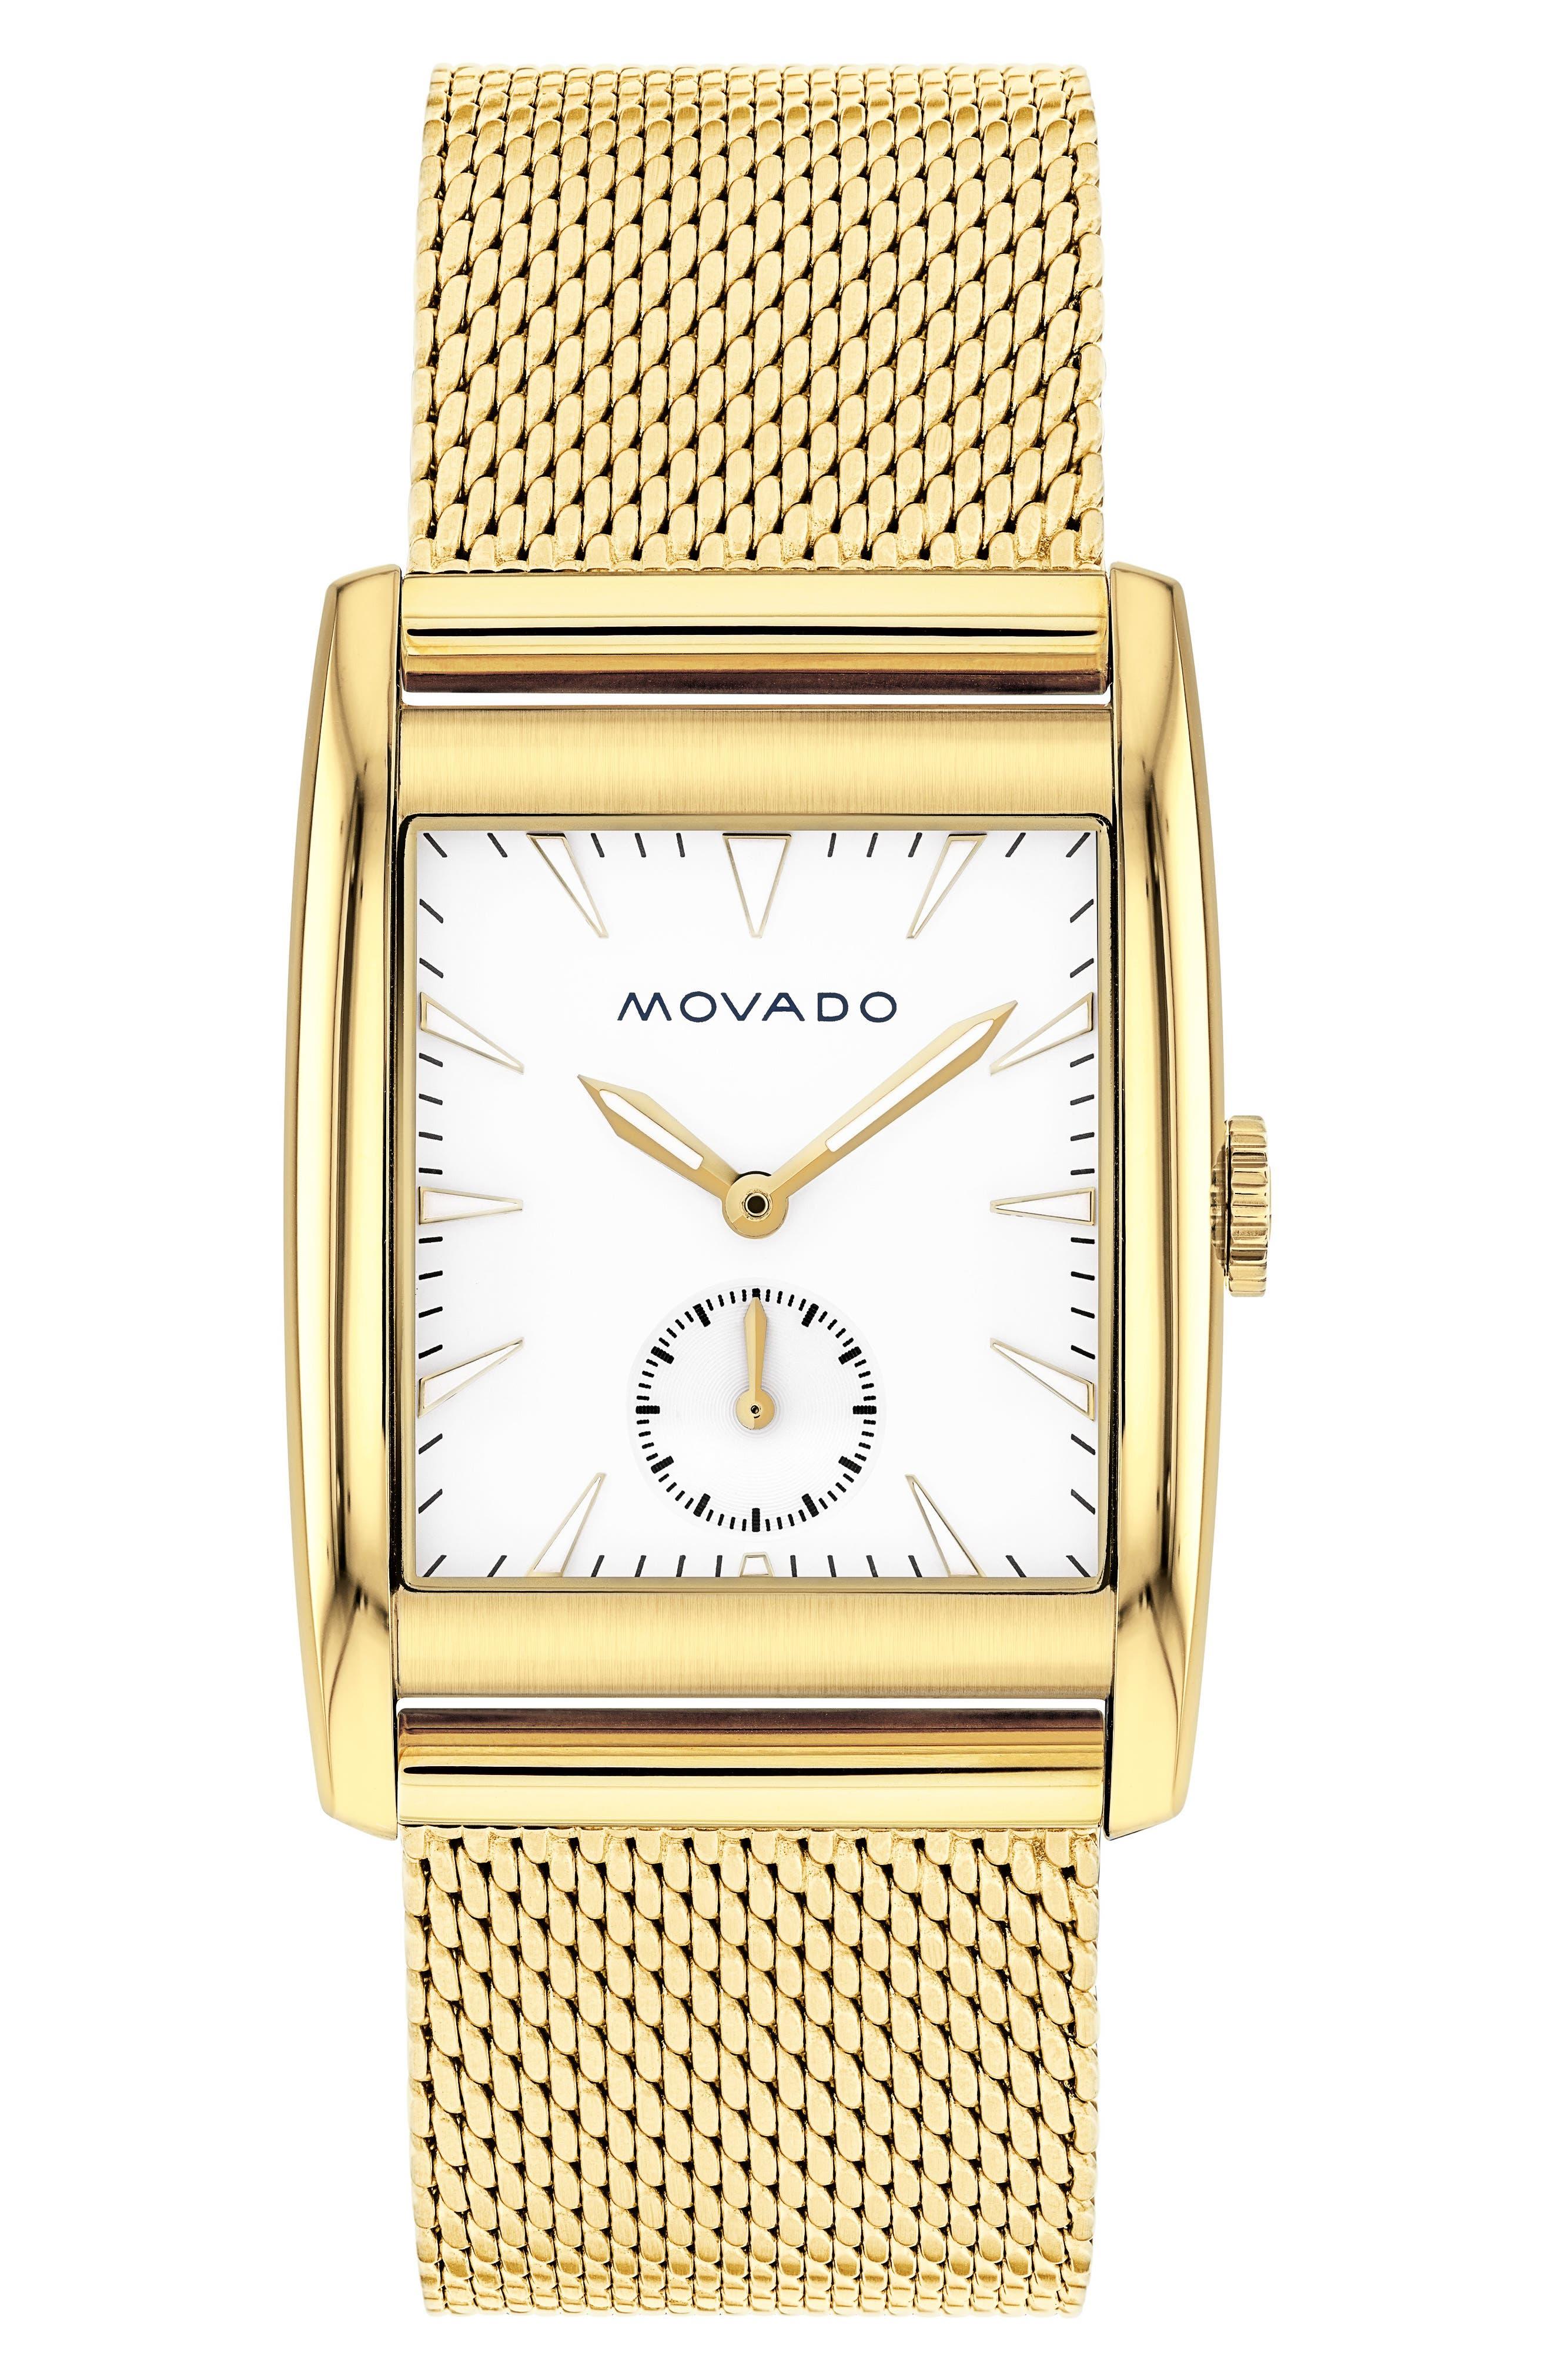 Main Image - Movado Heritage Mesh Strap Watch, 41mm